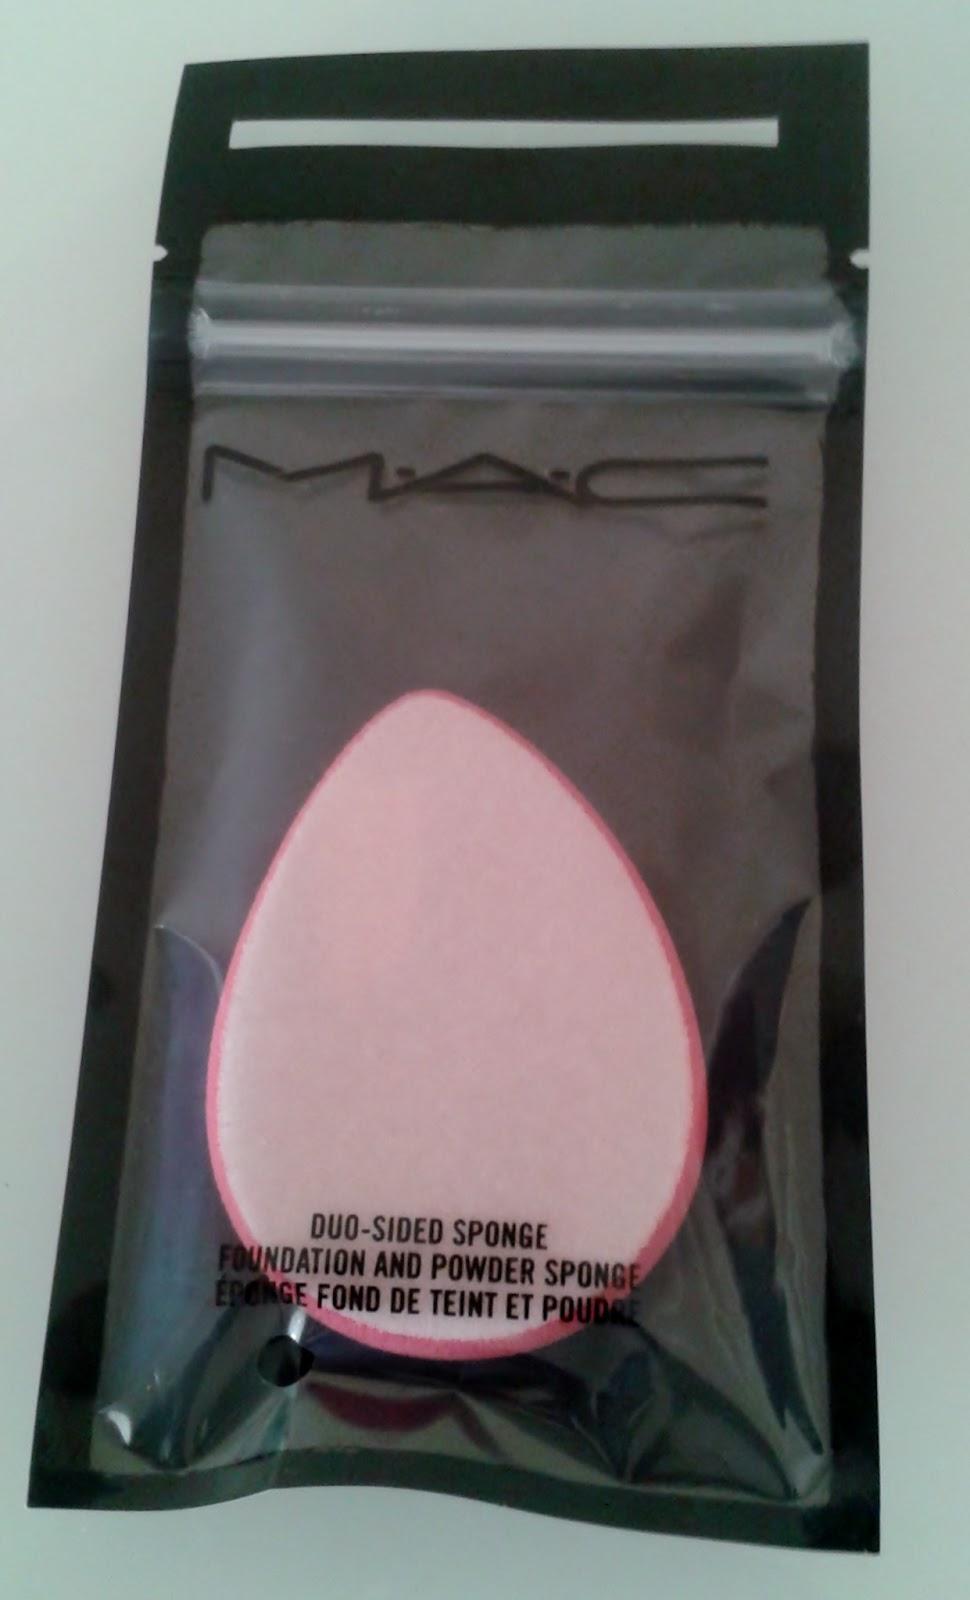 MAC Duo Sponge